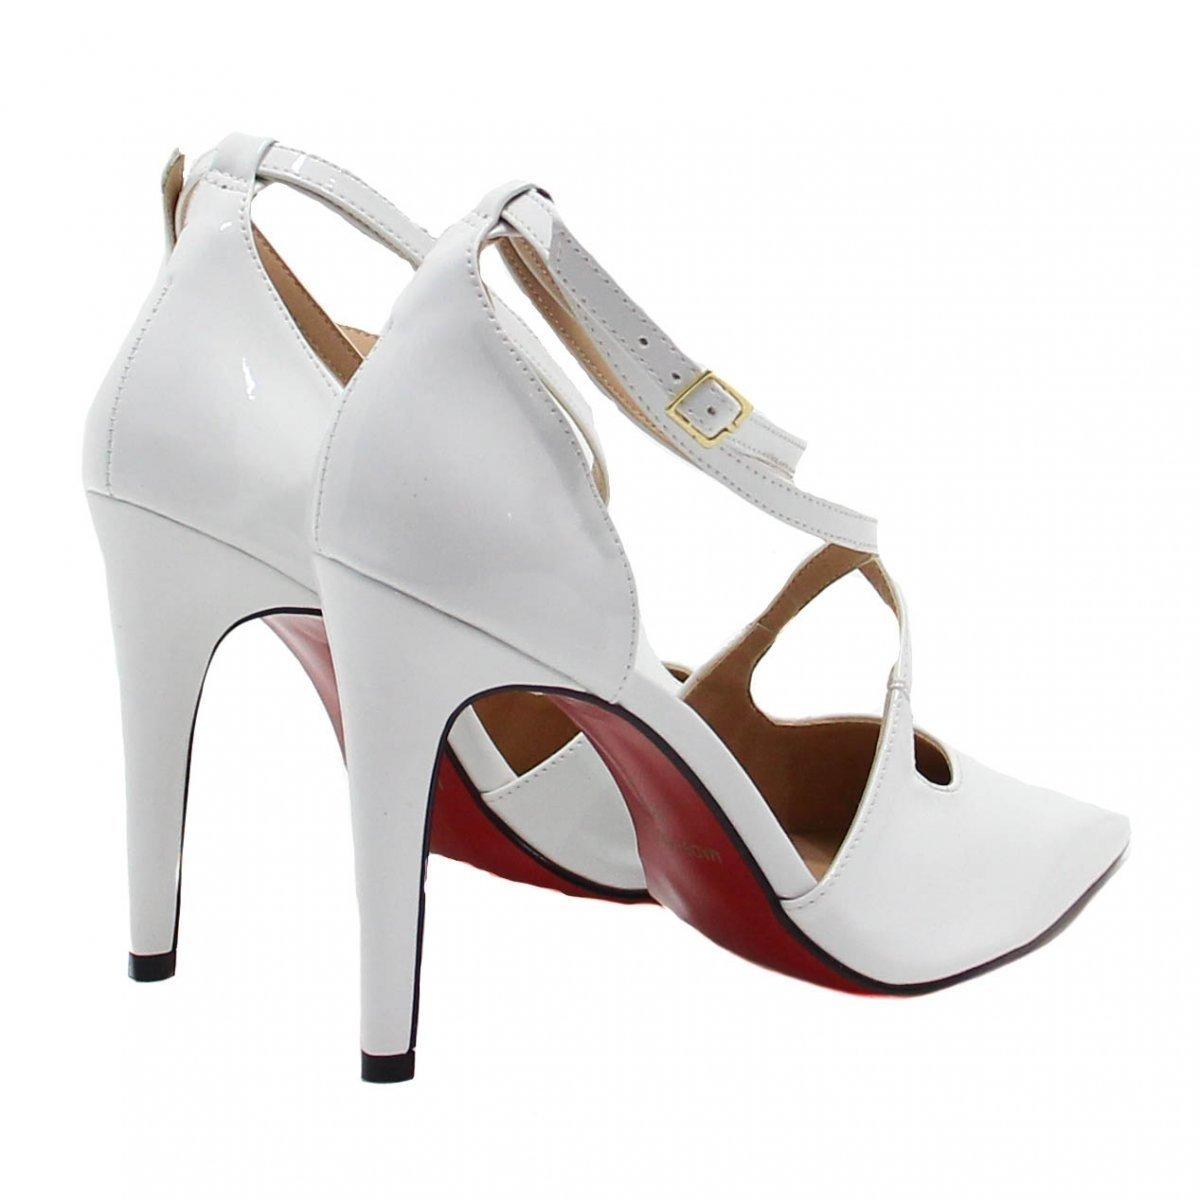 38fbfa6c65 Sapato Zariff Shoes Scarpin Noivas - Compre Agora